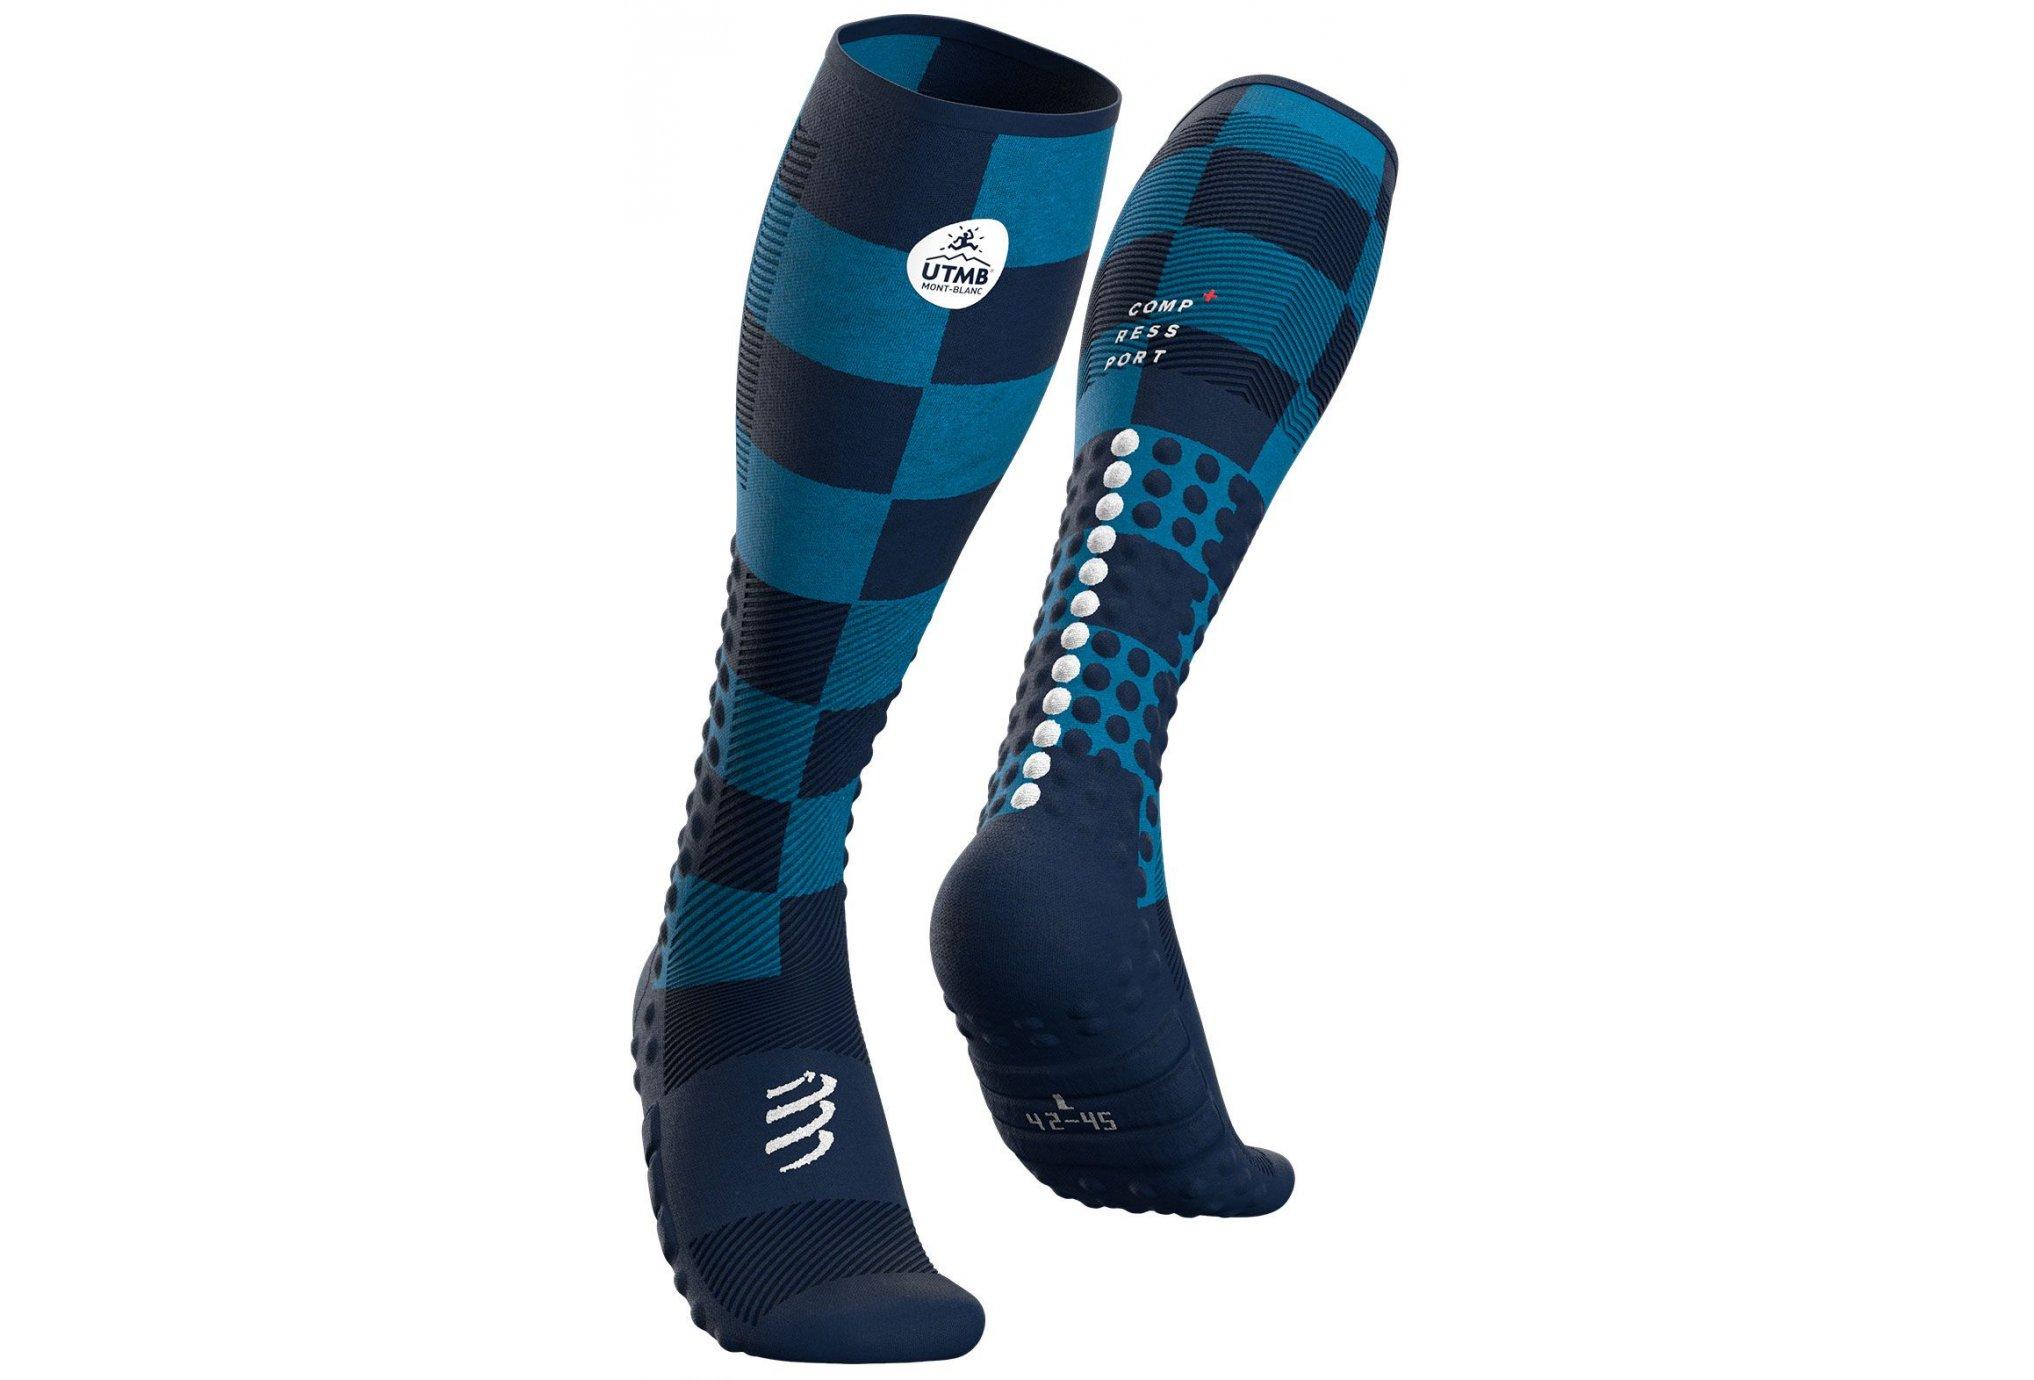 Compressport Full Socks Race & Recovery UTMB 2021 Chaussettes